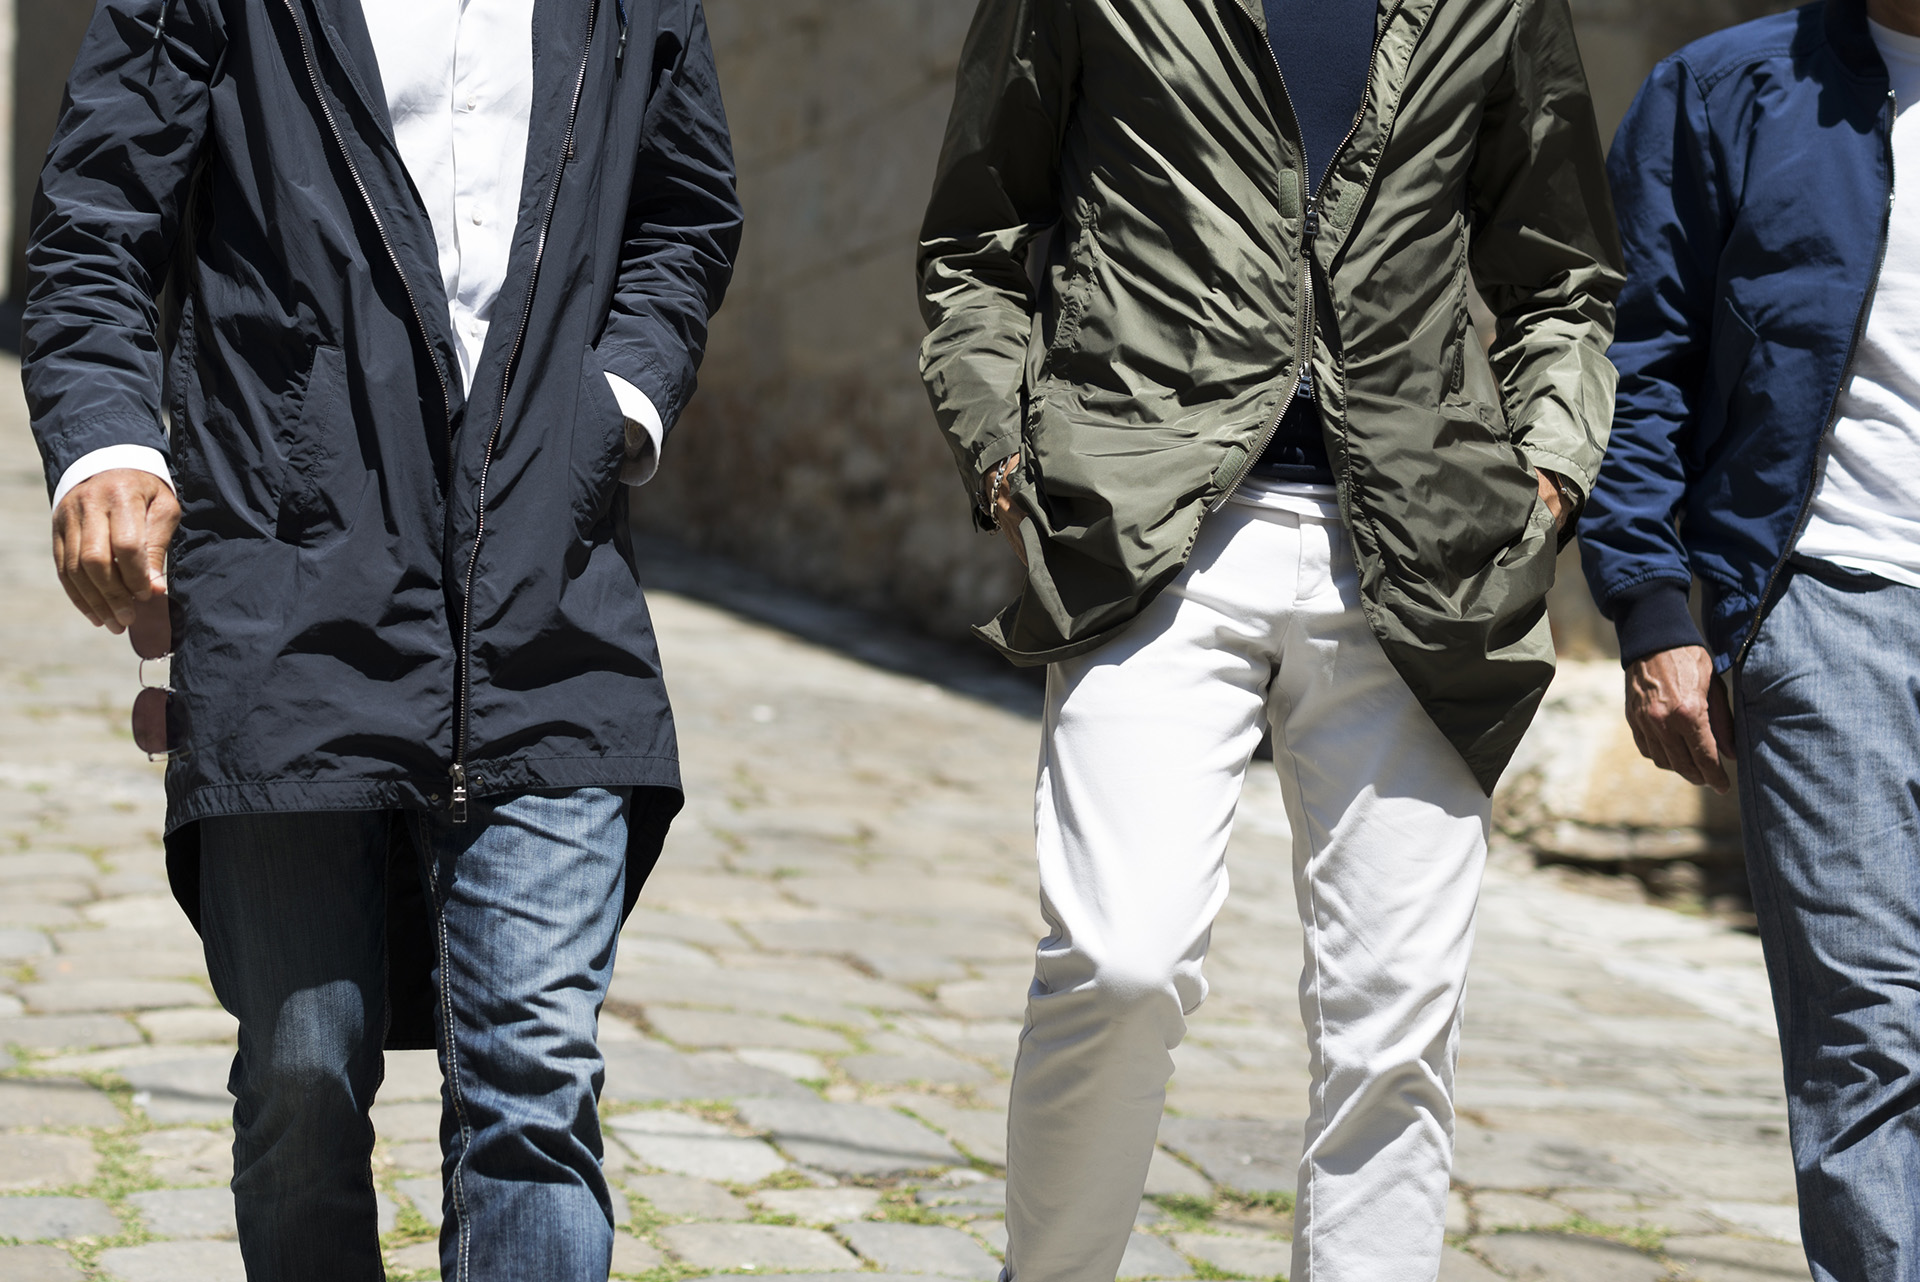 Mida-menswear-spring-summer-2017-3-men-walking-raincoat